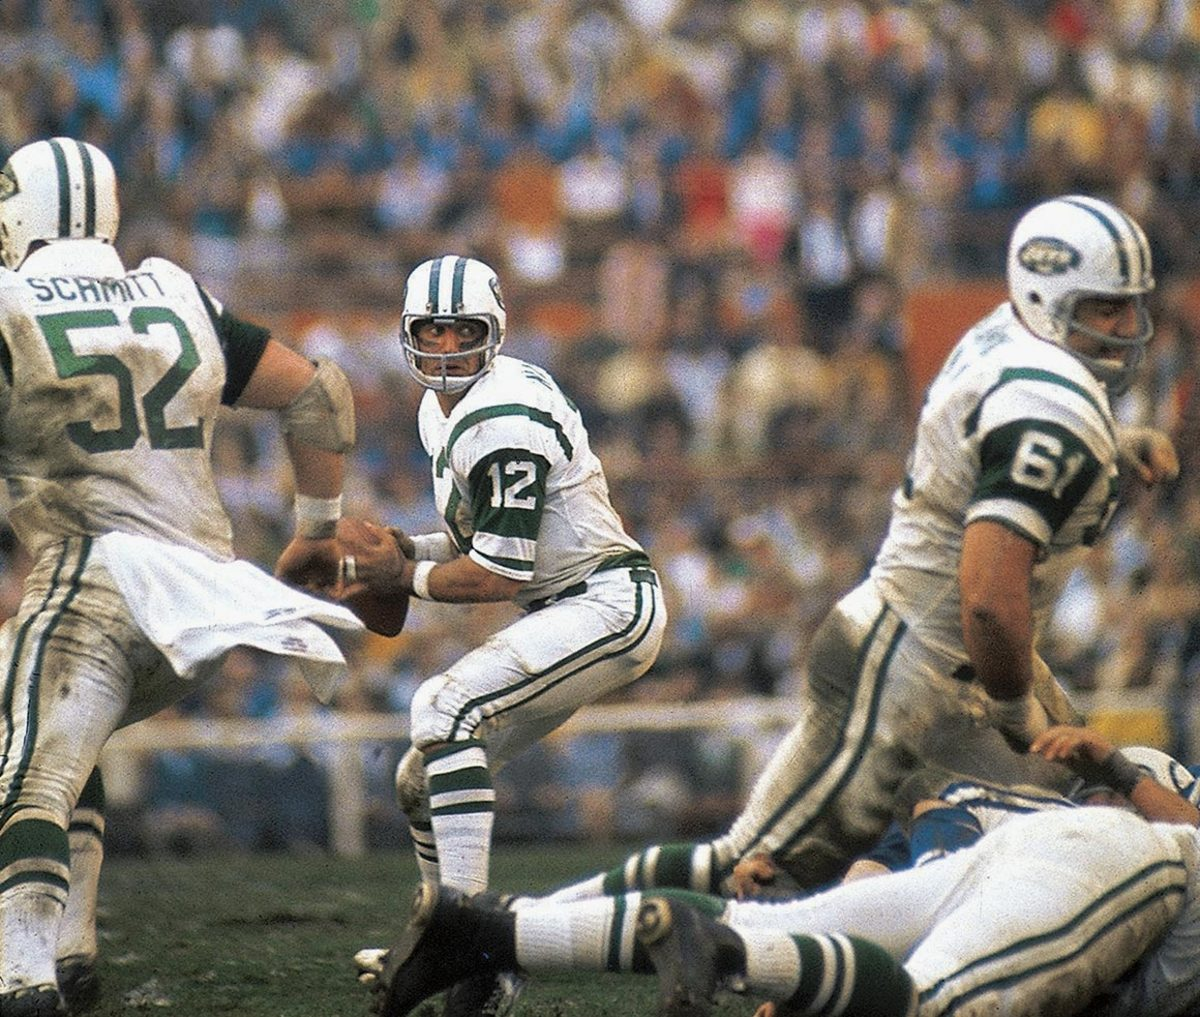 1969-0112-Super-Bowl-III-Joe-Namath-001319770.jpg